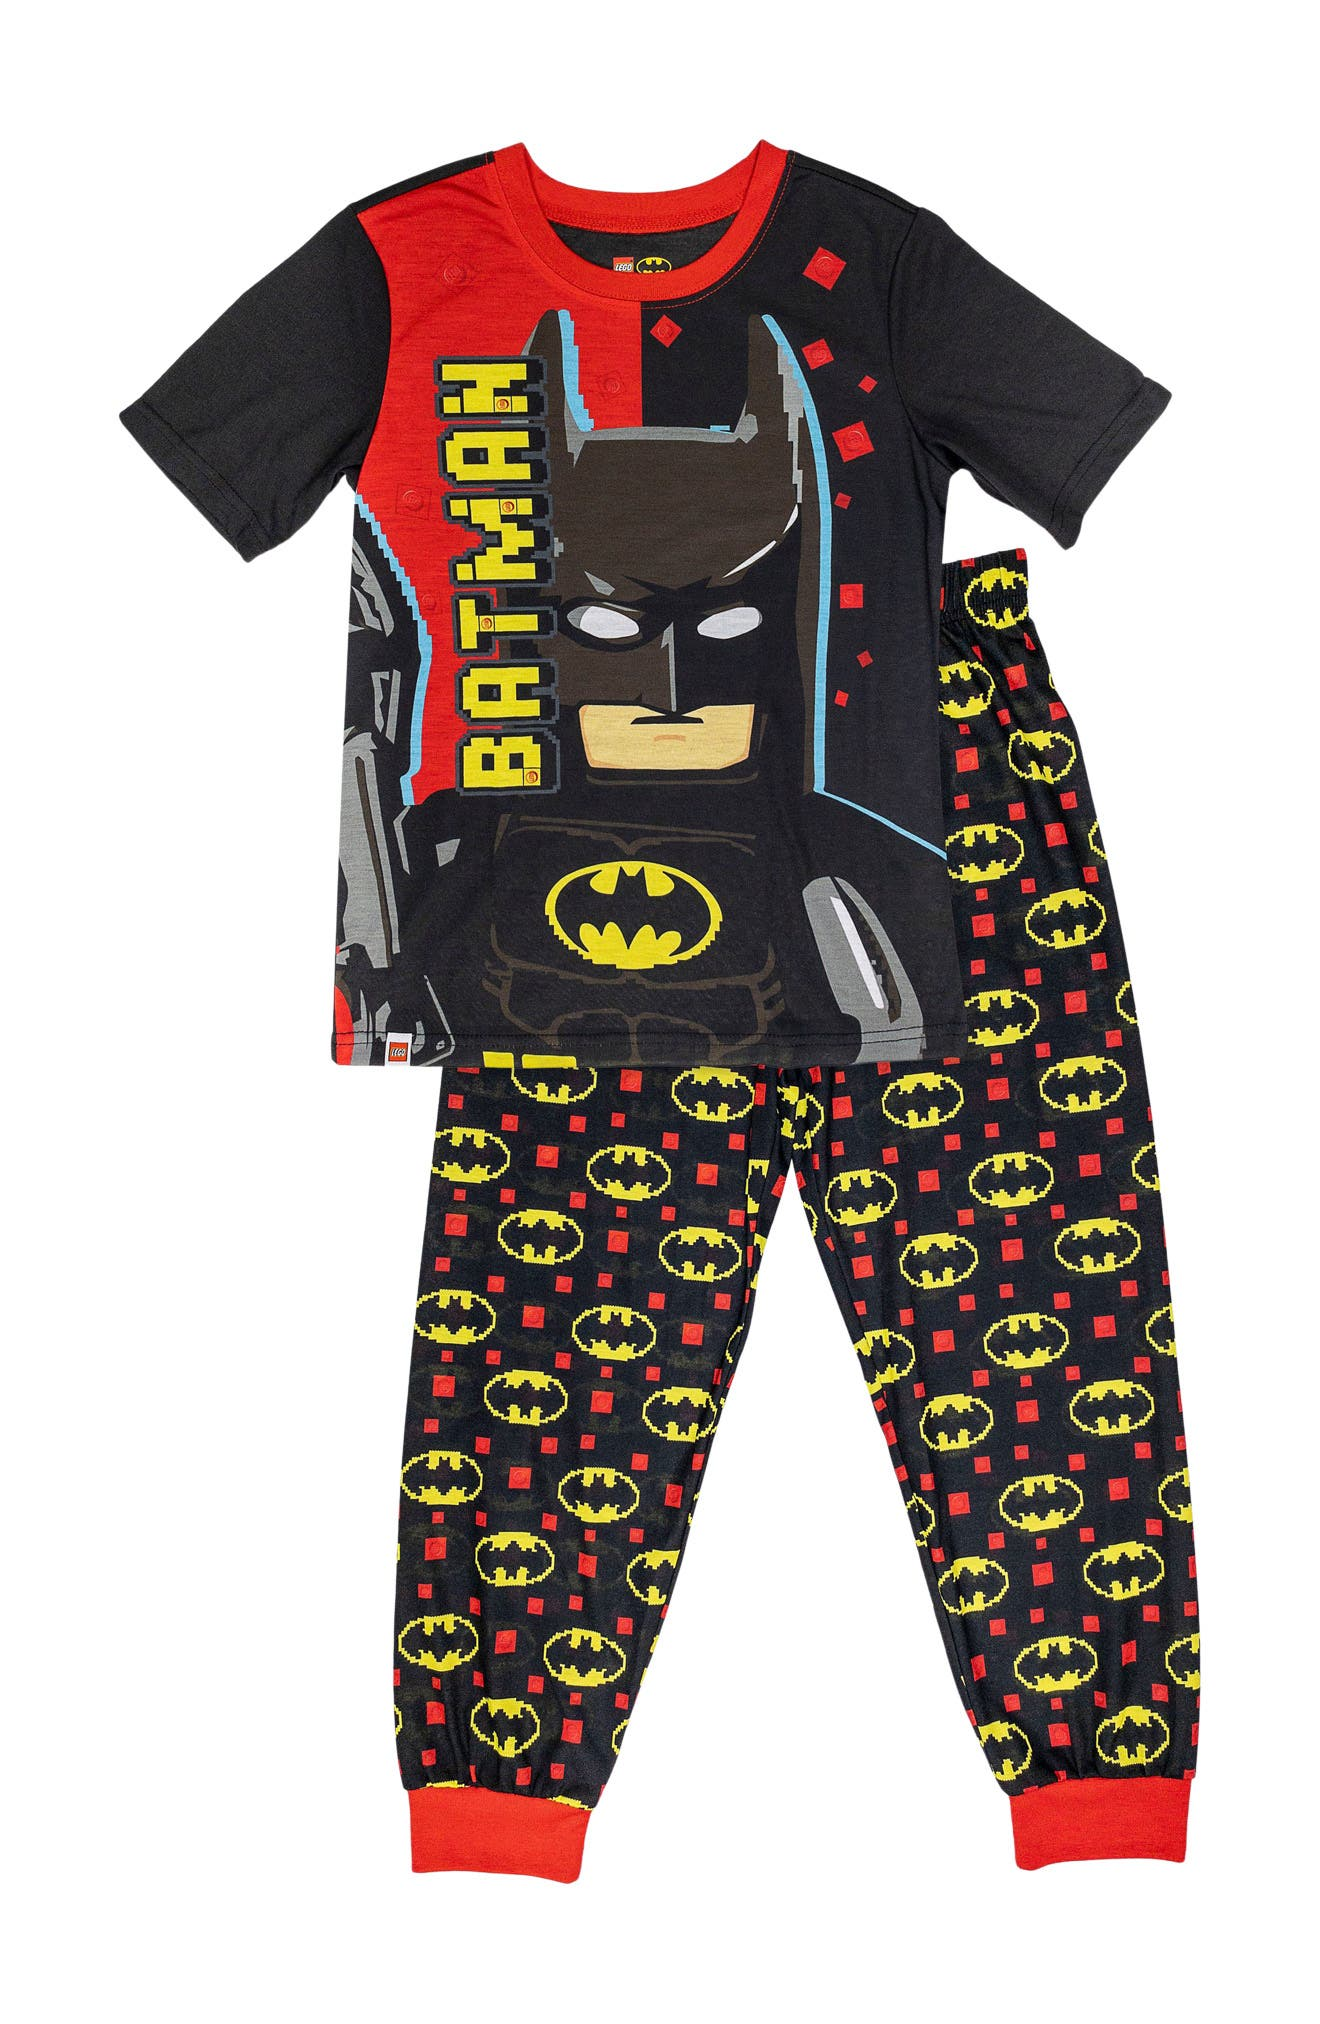 Image of SGI Apparel Lego Batman 2-Piece Pajama Set